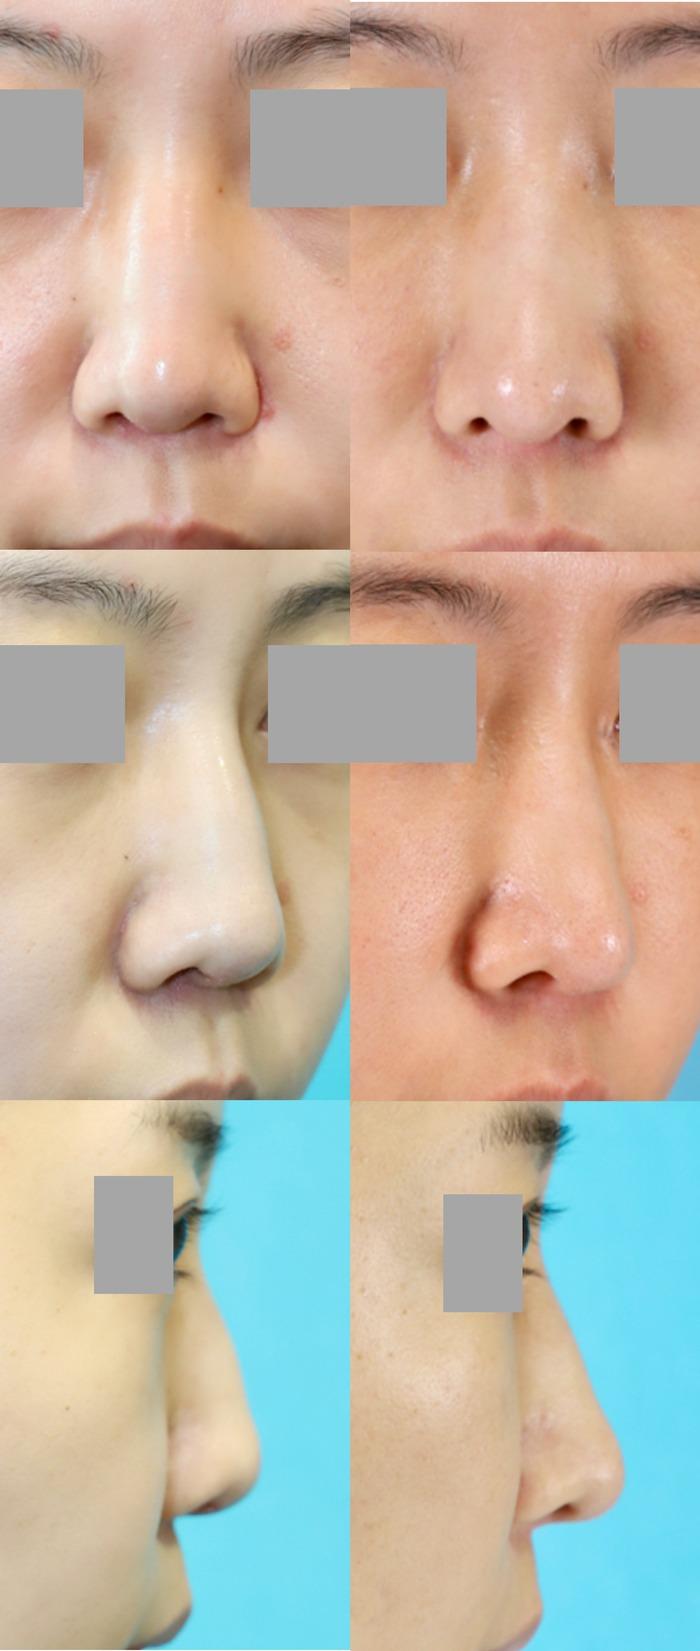 鼻中隔延長術 前額・頬脂肪注入 アゴ削り 拡大